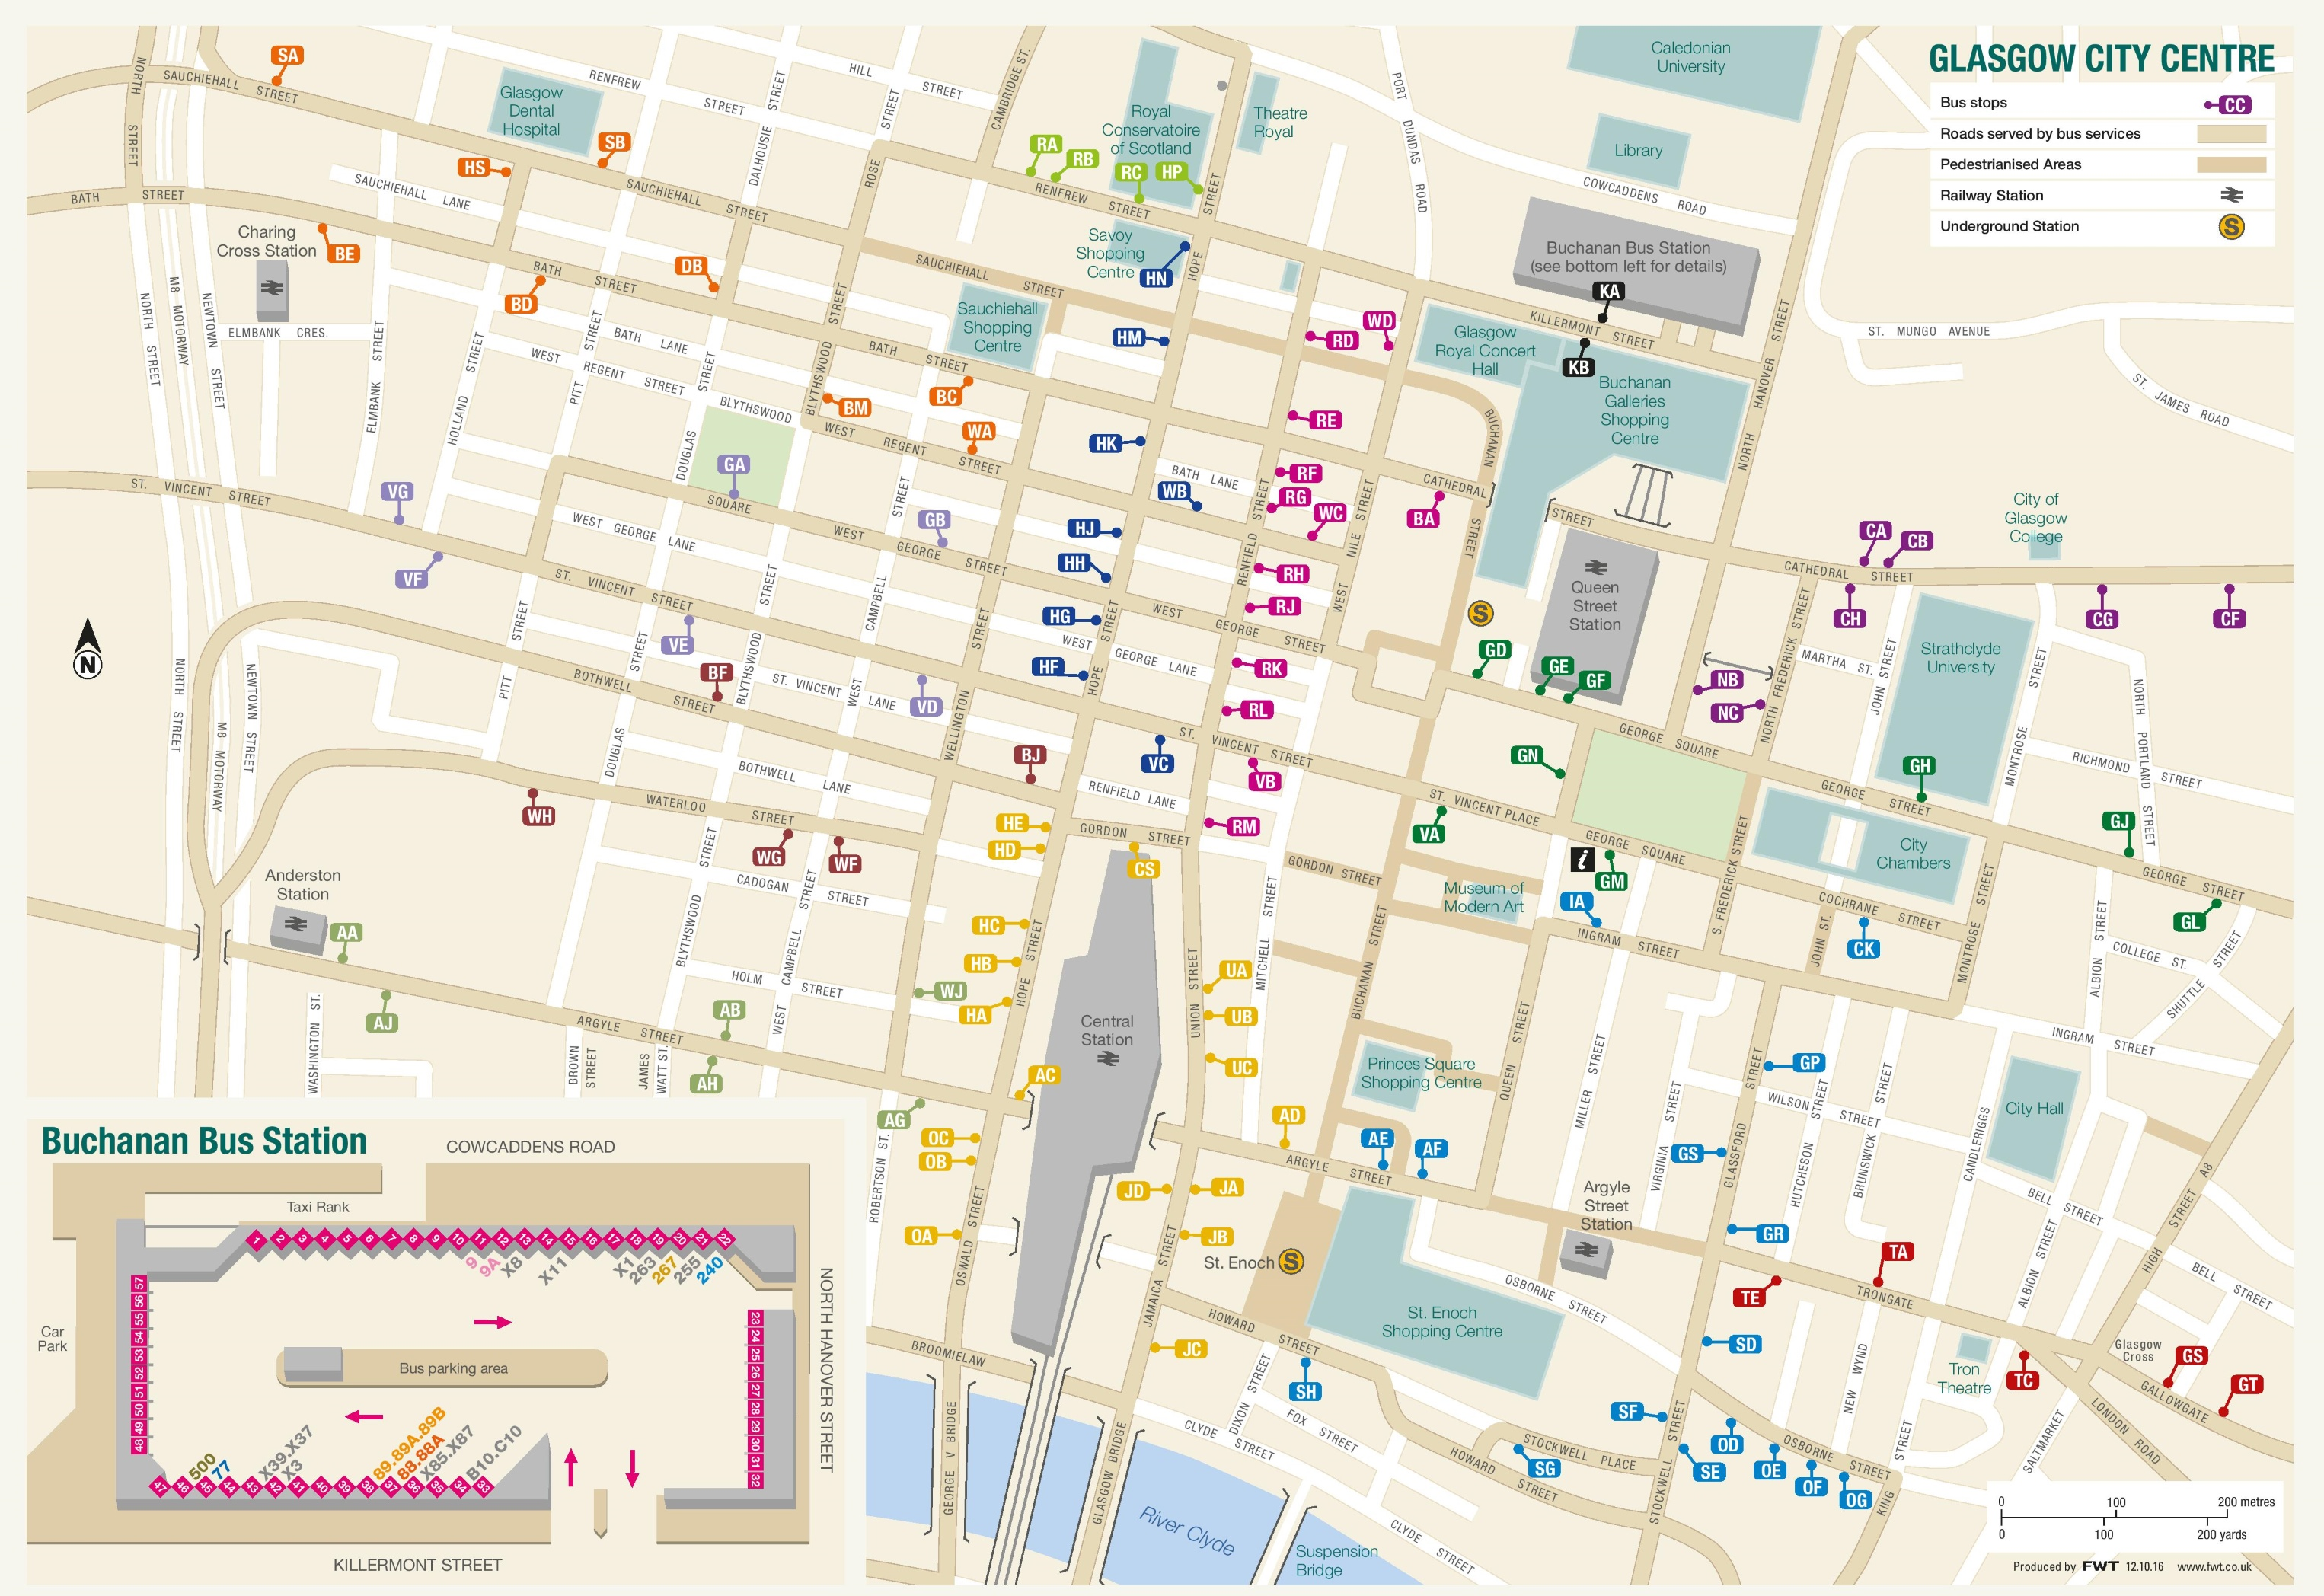 Map Of Glasgow Glasgow city center map Map Of Glasgow